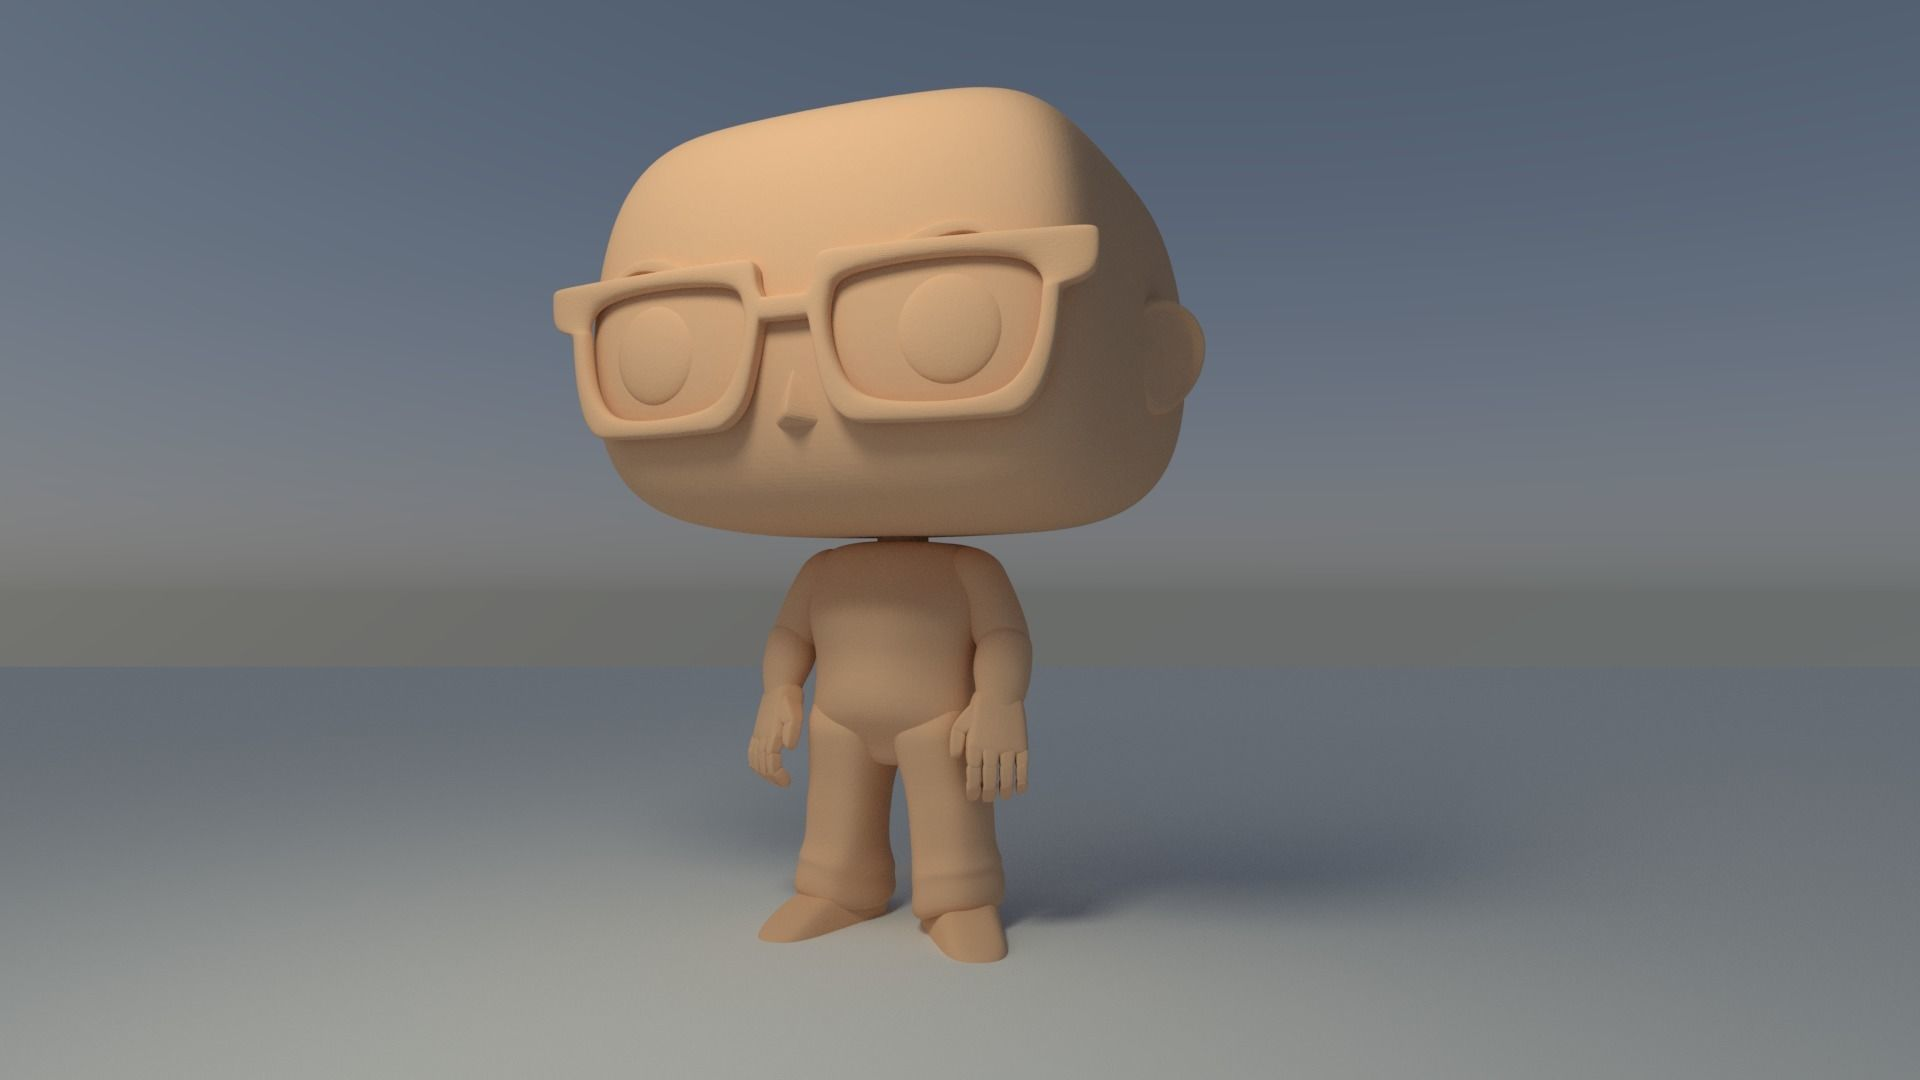 Custom Pop Bald Man Glasses Figure 3D Print 3D print model